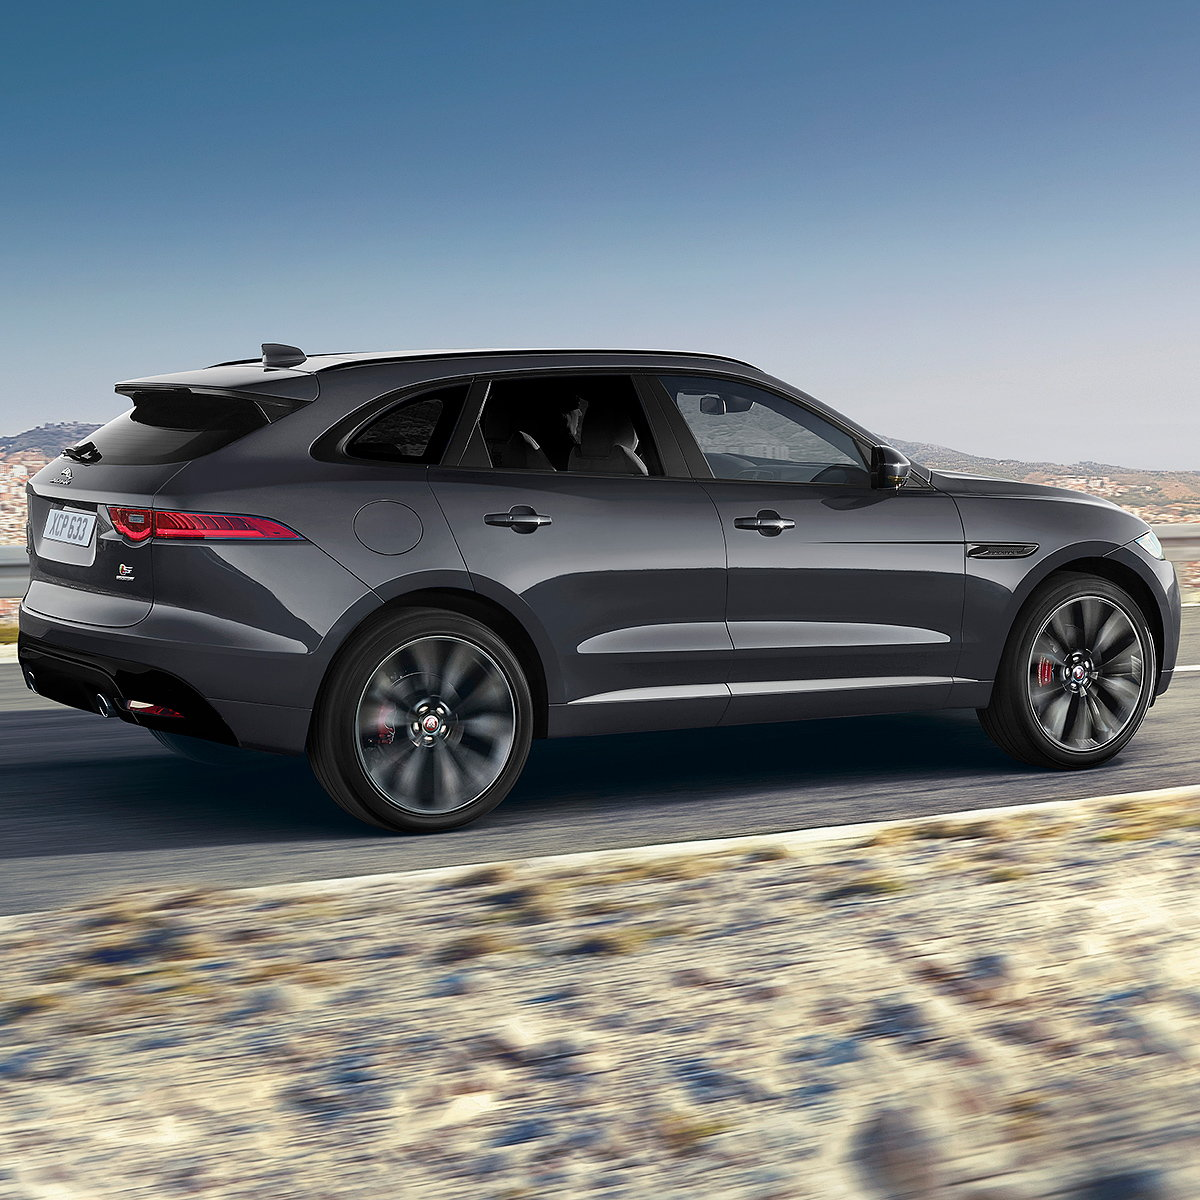 Jaguar Cx17 Release Date: Jaguar F-Pace Designer Edition